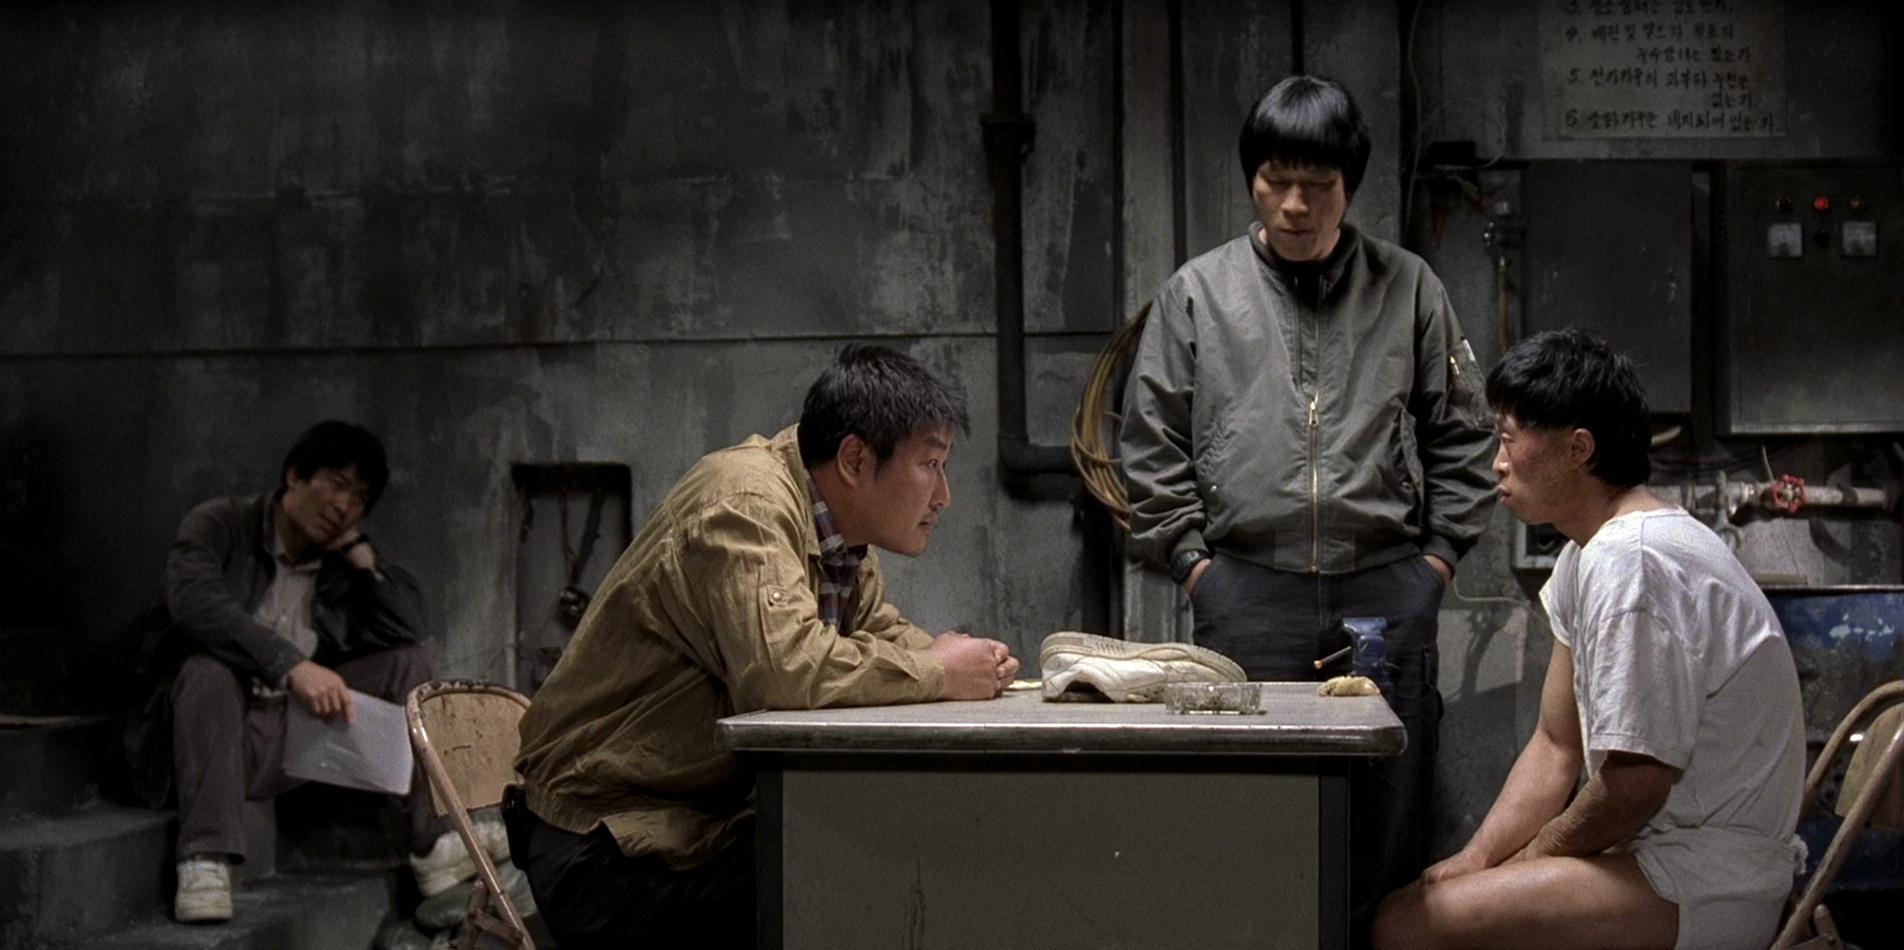 Le génial Bong Joon-Ho (Memories of Murder, The Host et Snowpiercer) reviendra en 2019 avec